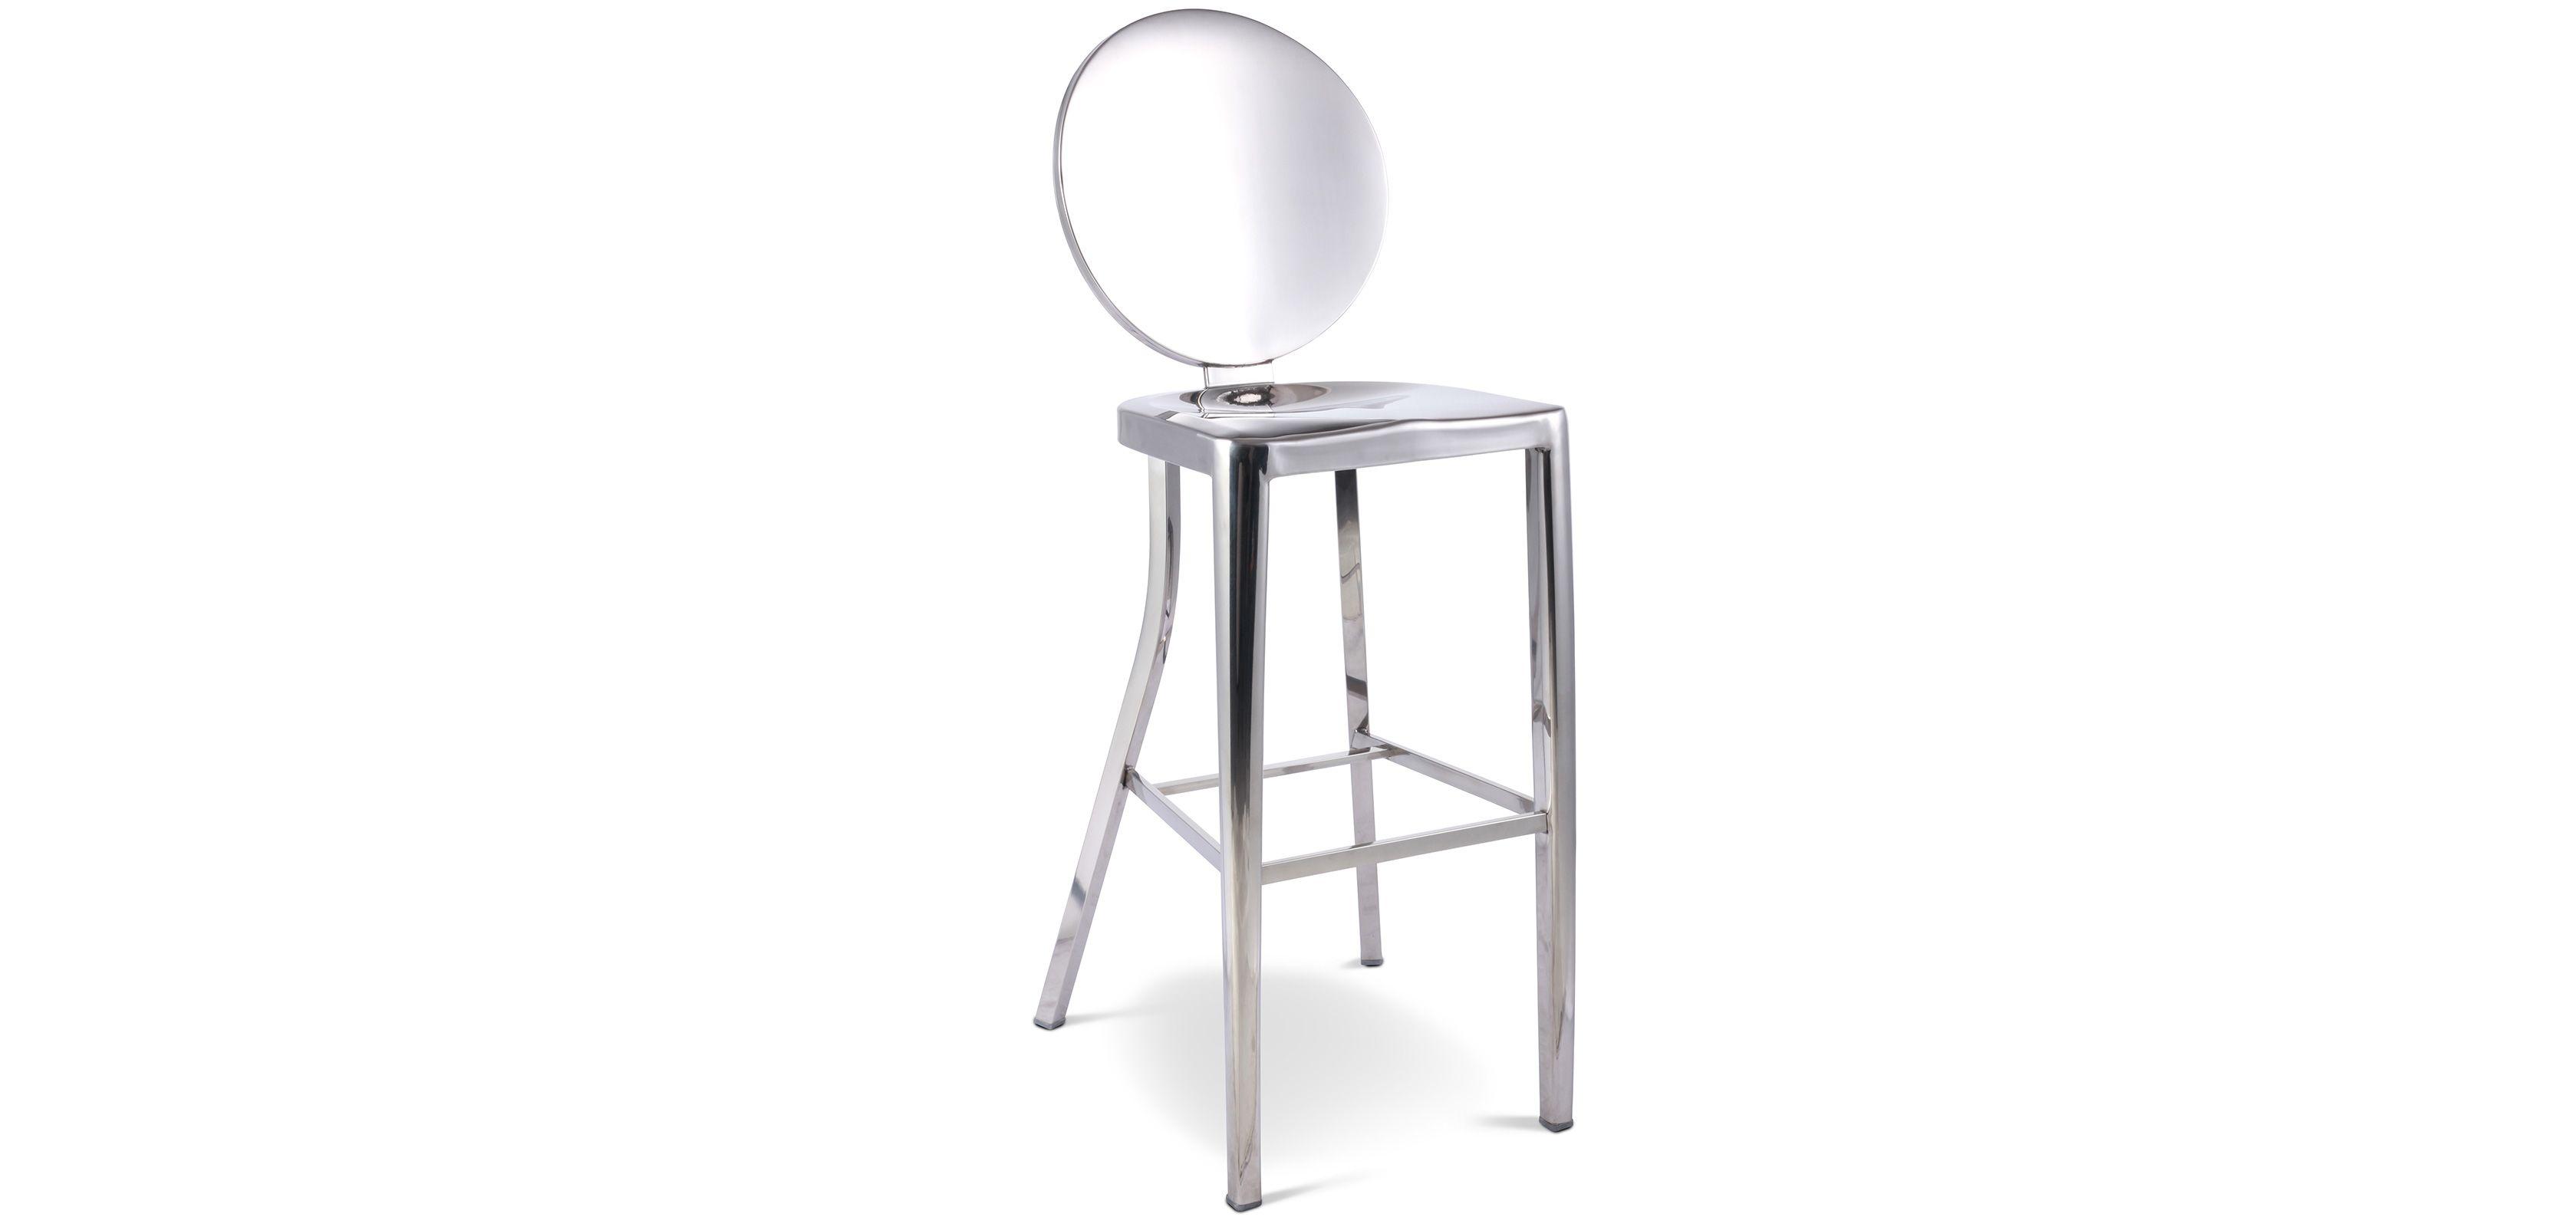 Tabouret De Bar Design Kong Sans Accoudoirs Philippe Starck Inspiration 60cm Design Philippe Starck Inspiration